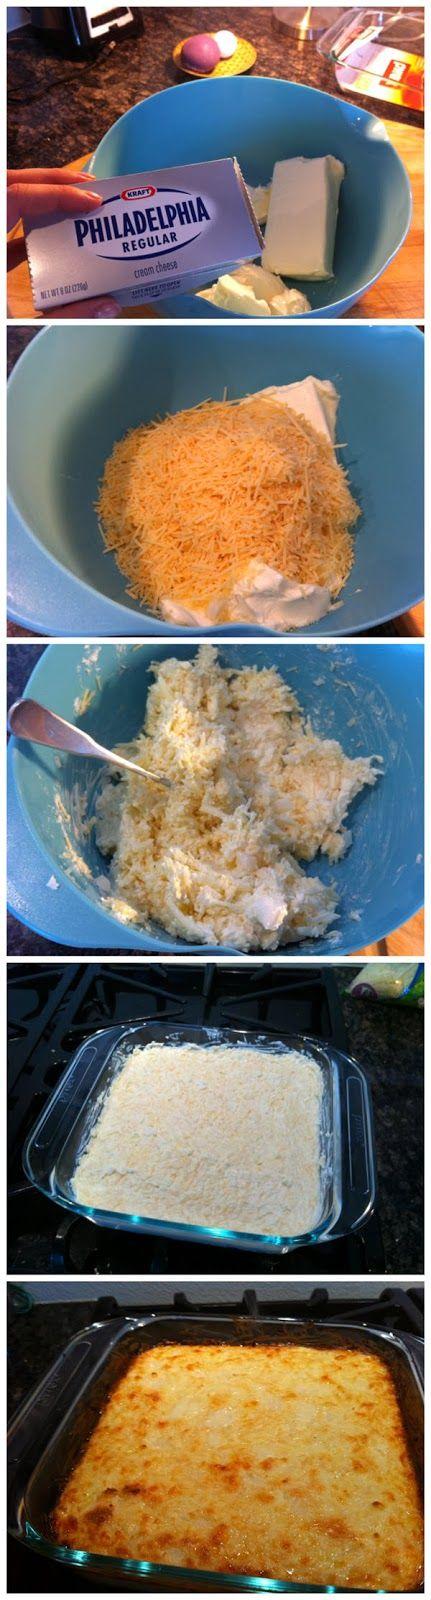 White Queso Dip 2 blocks cream cheese 1/2 cup chopped onions  1/2 cup mayo 1 (8 oz) pkg shredded monterrey jack cheese - 1 (8 oz) pkg shredded parmesan